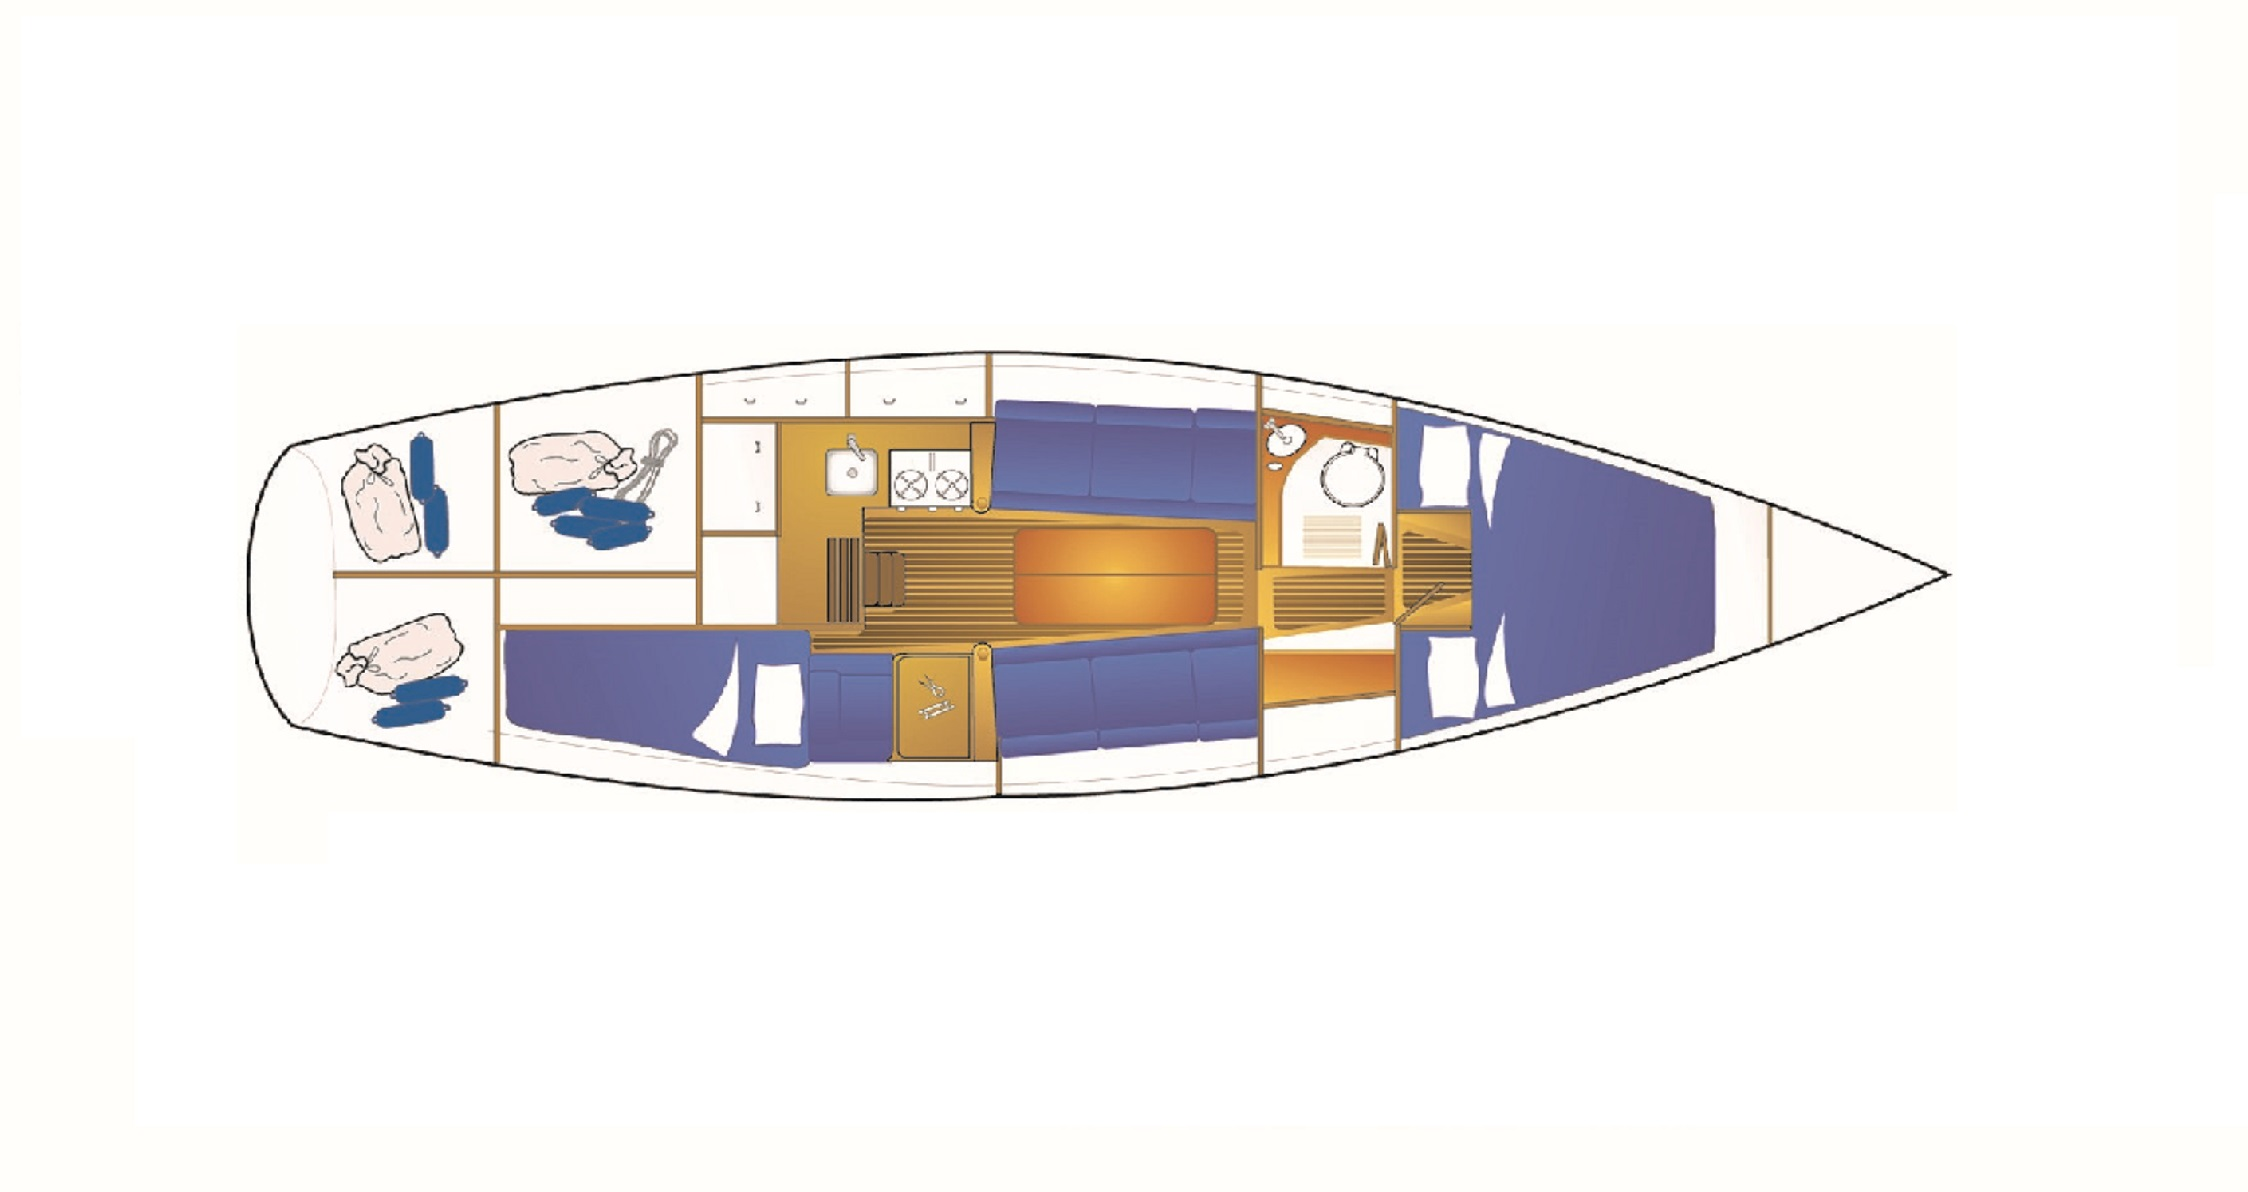 mystery35-interior-plan